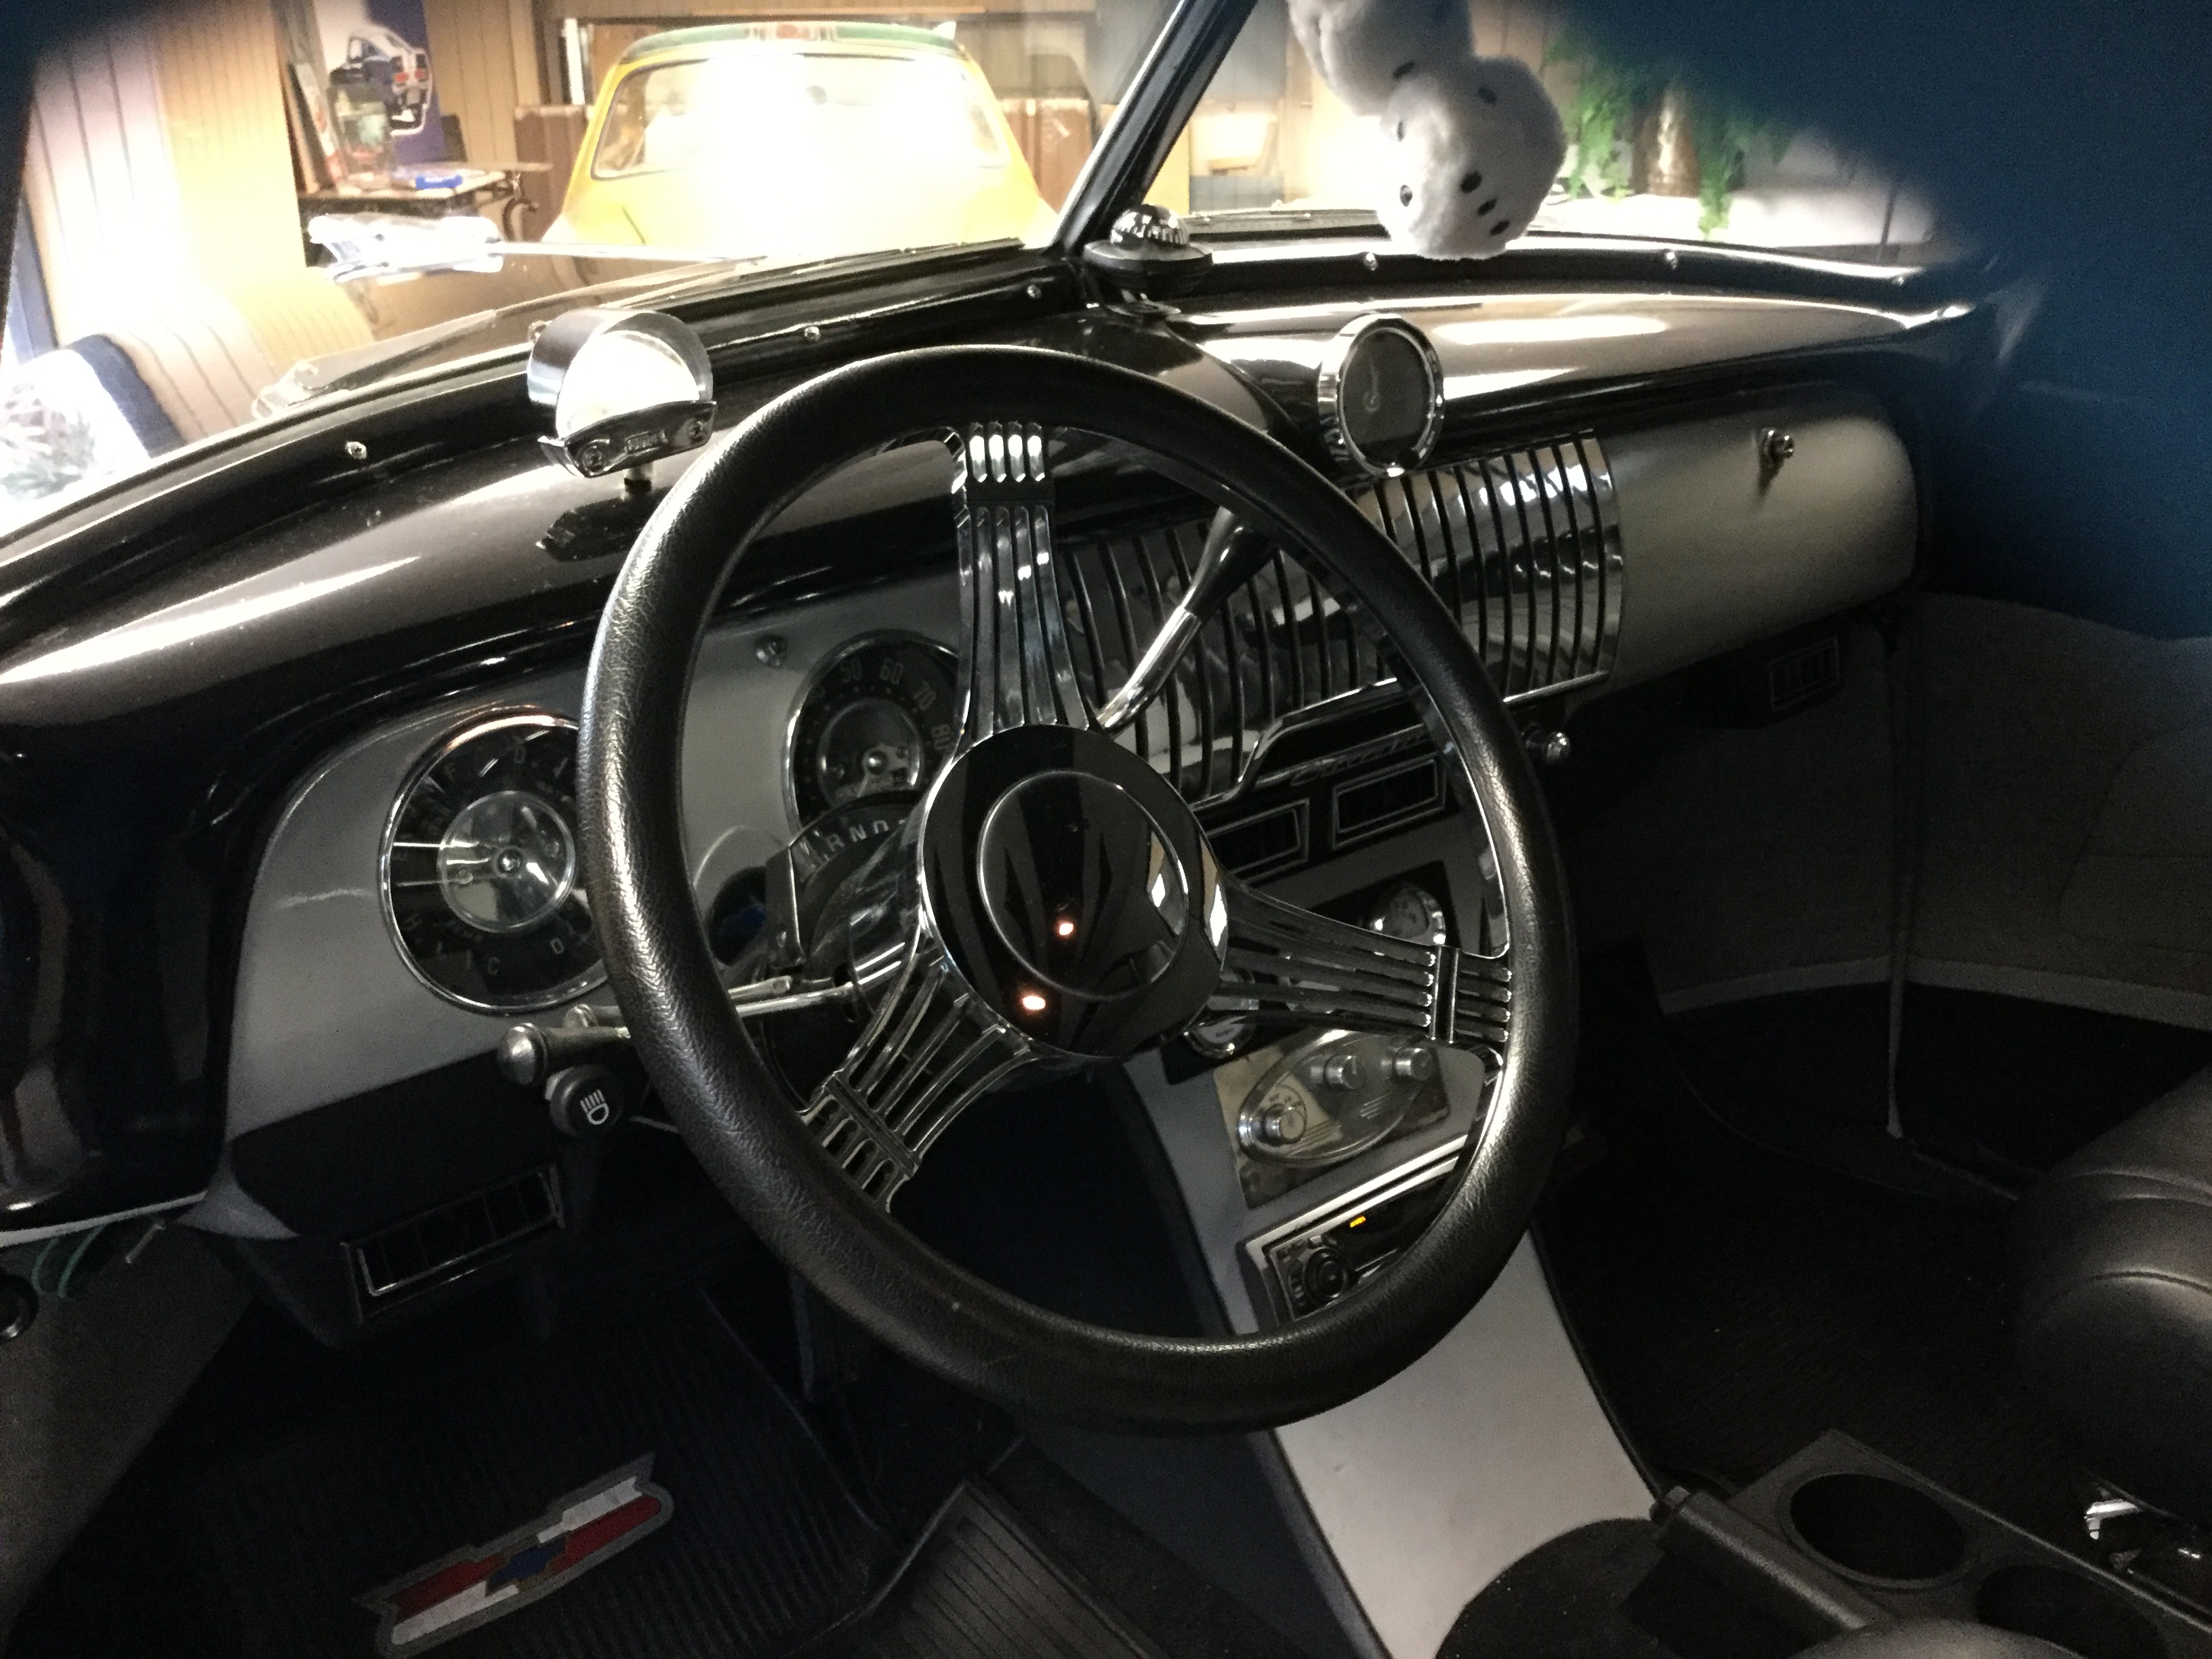 Bullitt Classic Cars 1951 Chevy Sedan Delivery Panel Truck Img 1090 1070 1089 0224